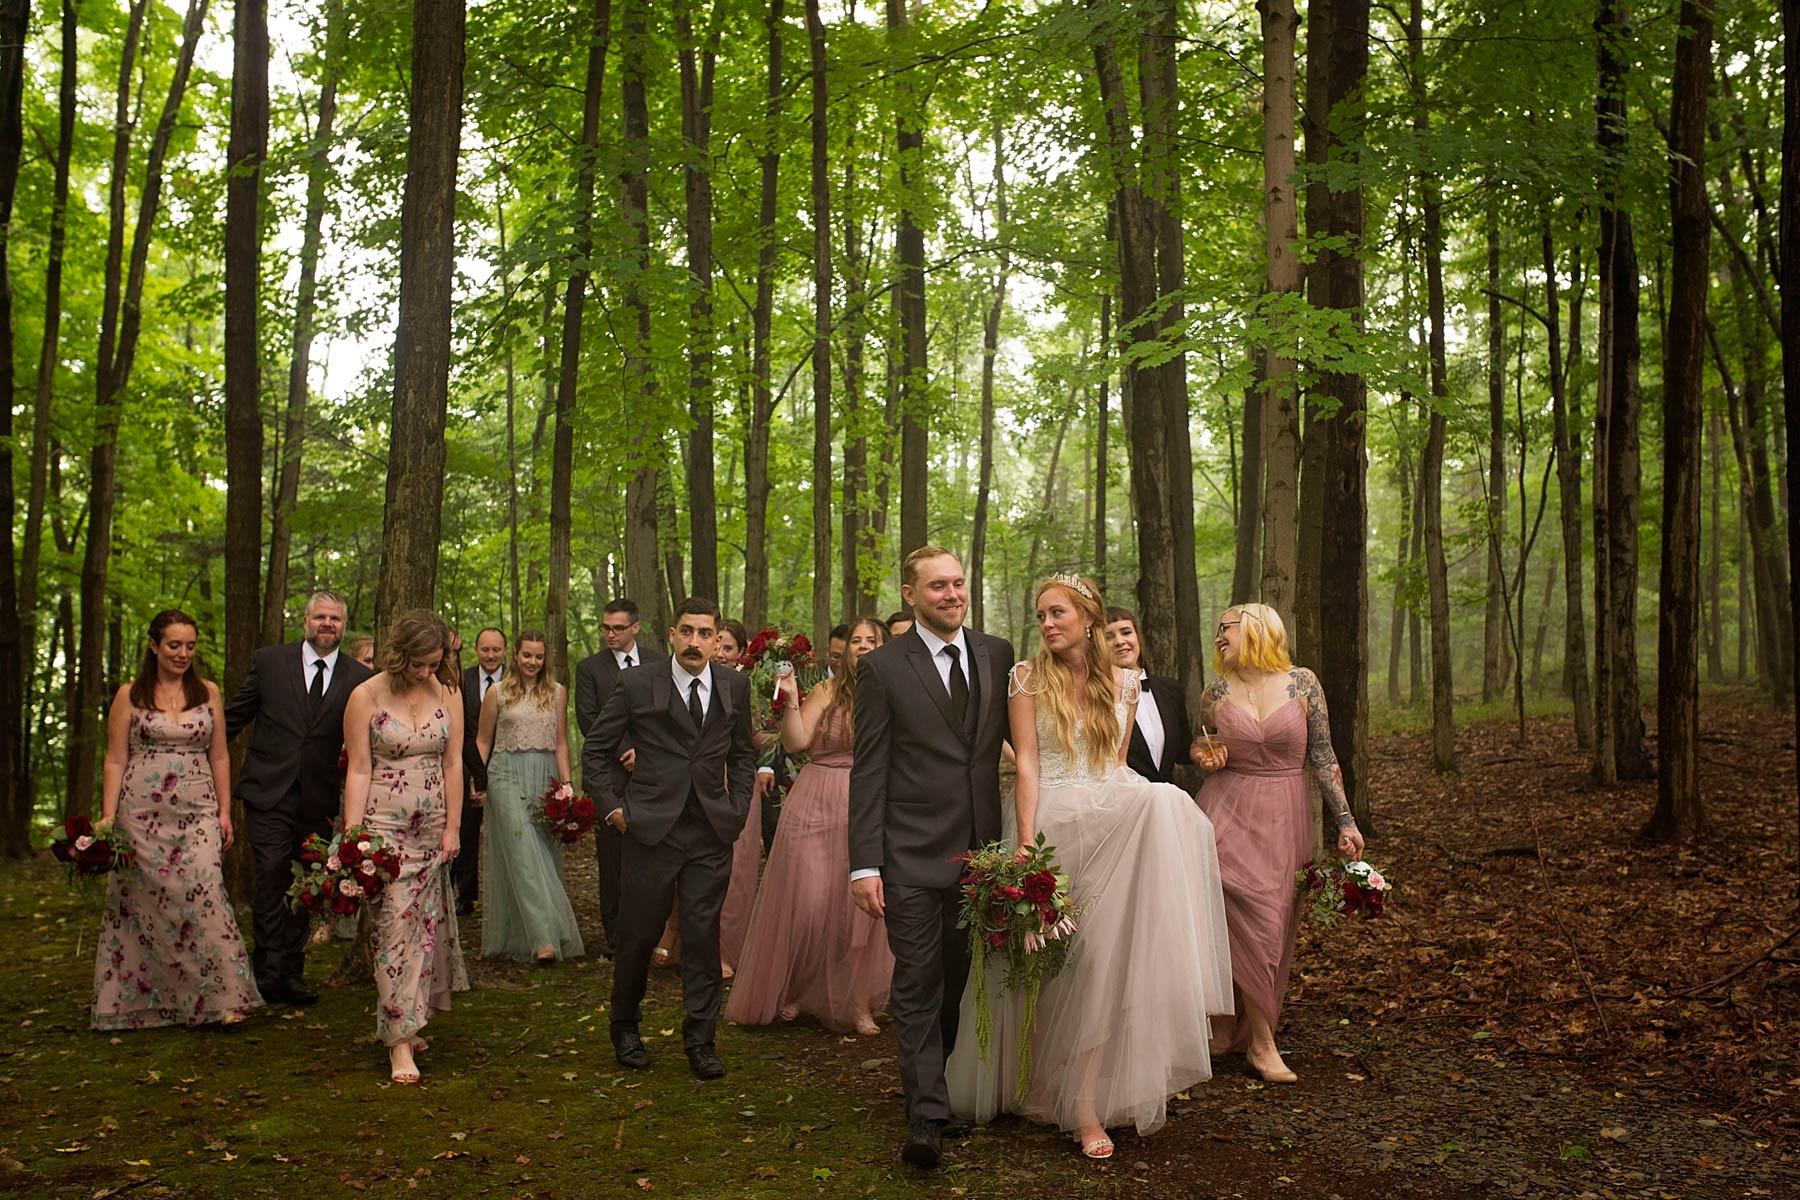 Bucks_County_wedding_photographer_Stroudsmoor_country_inn_wedding_Philadelphia_wedding_photographer_24_woodland_wedding_party.jpg